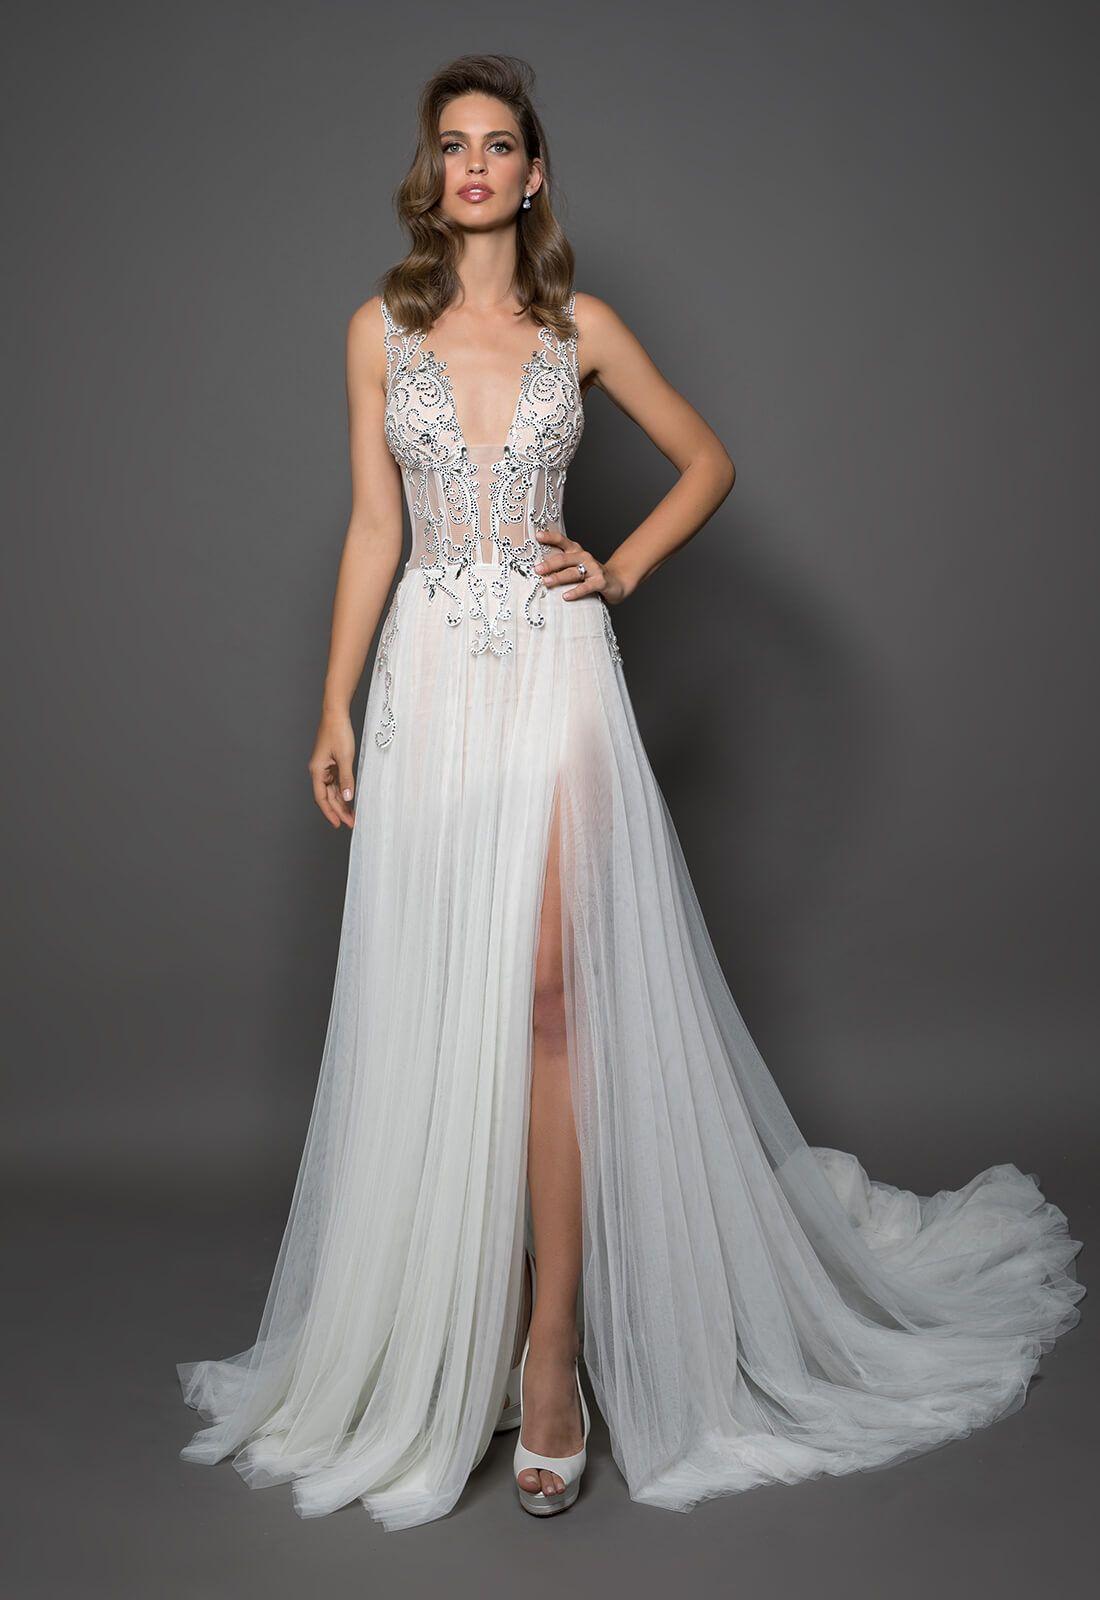 Sleeveless vneck sheath wedding dress with crystal corset bodice